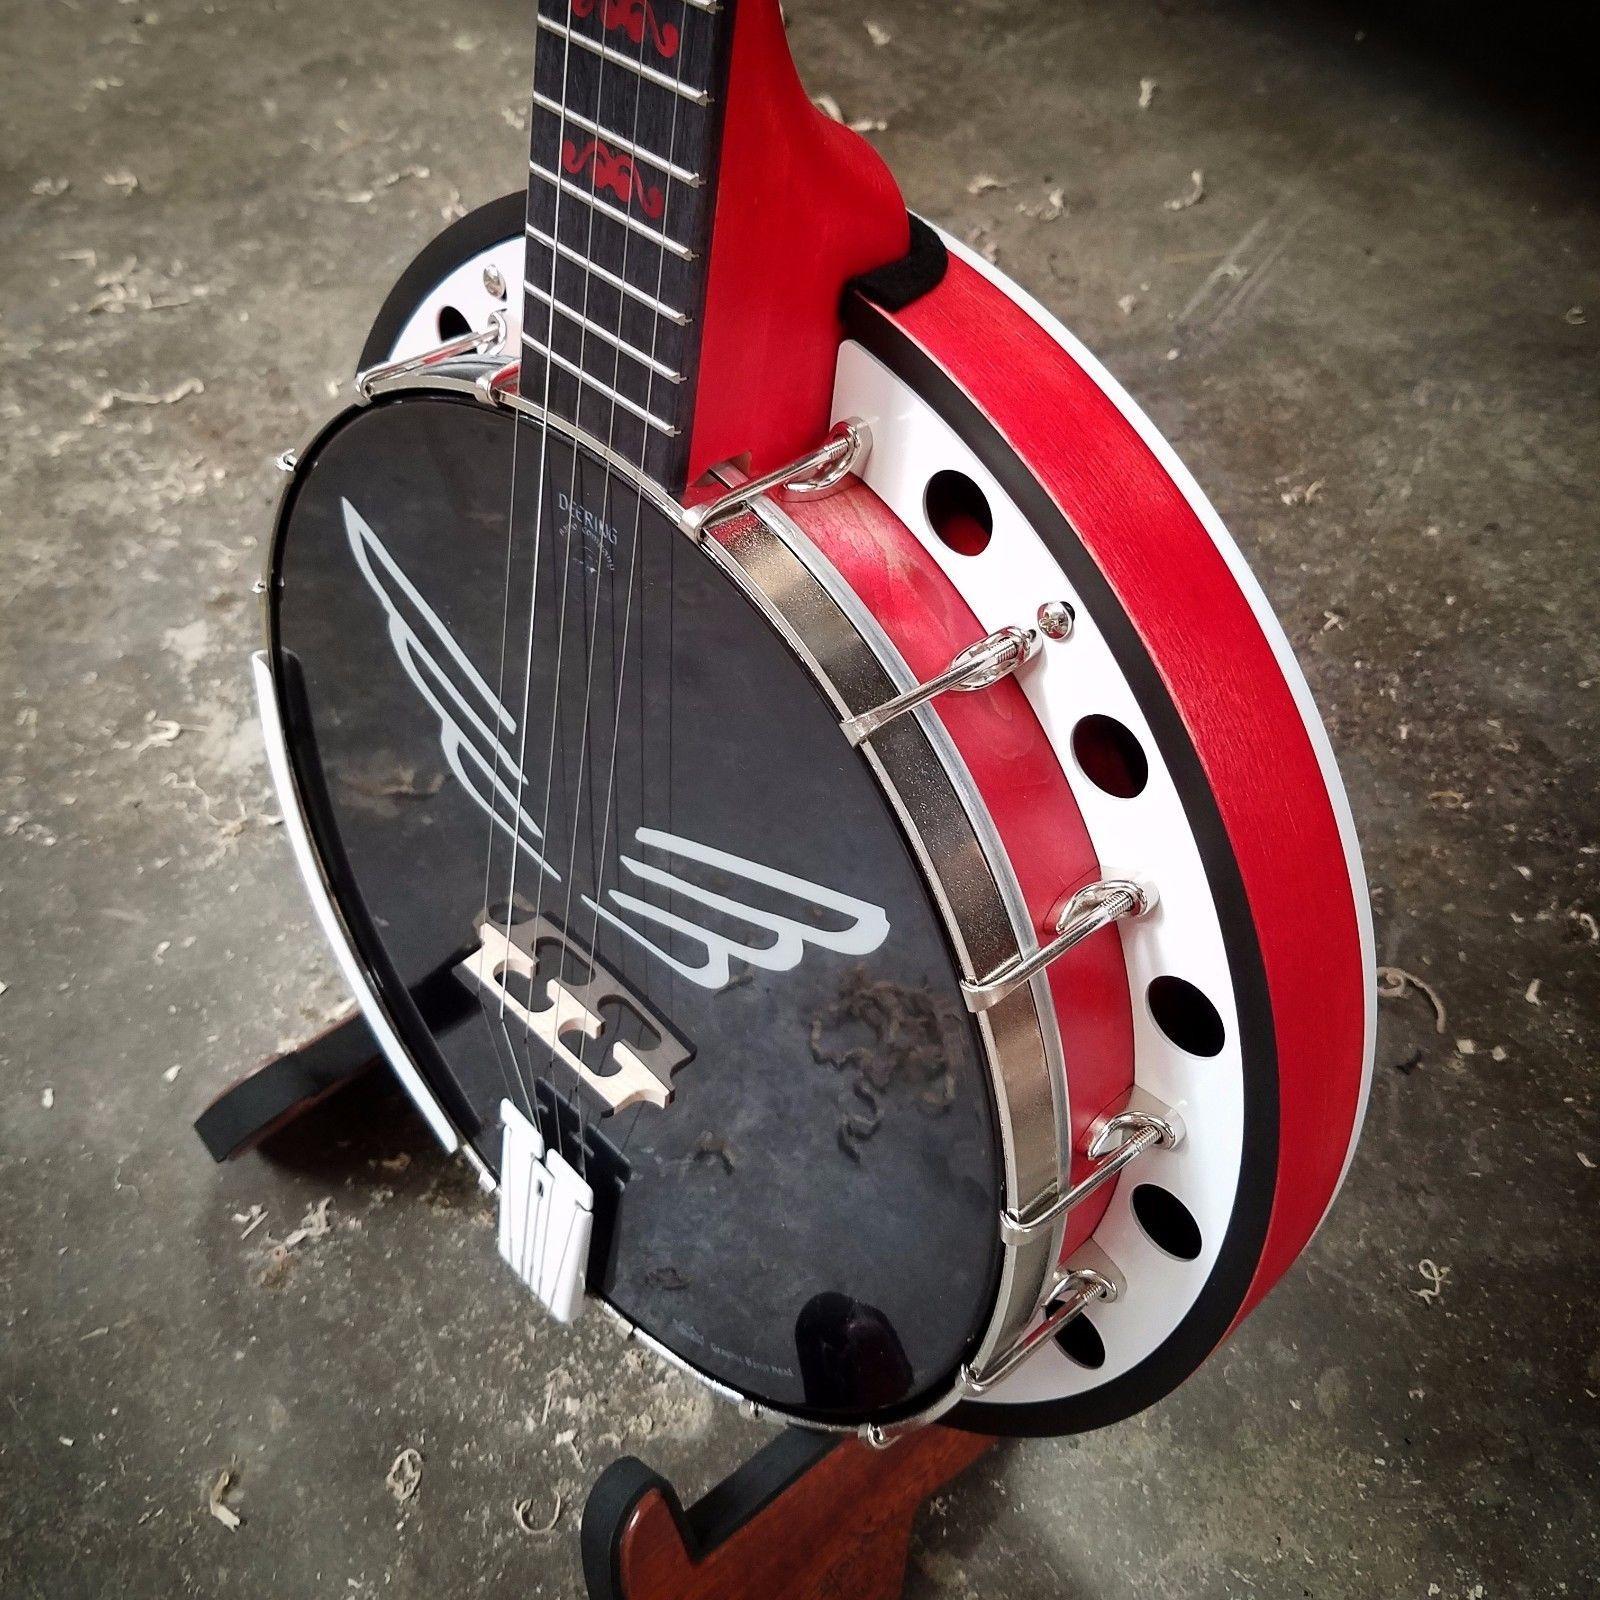 Mumford & Sons Signed Custom Deering Goodtime Banjo  CALIFORNIA! https://t.co/MBcE4NTUmt https://t.co/EwJh6L0uNt